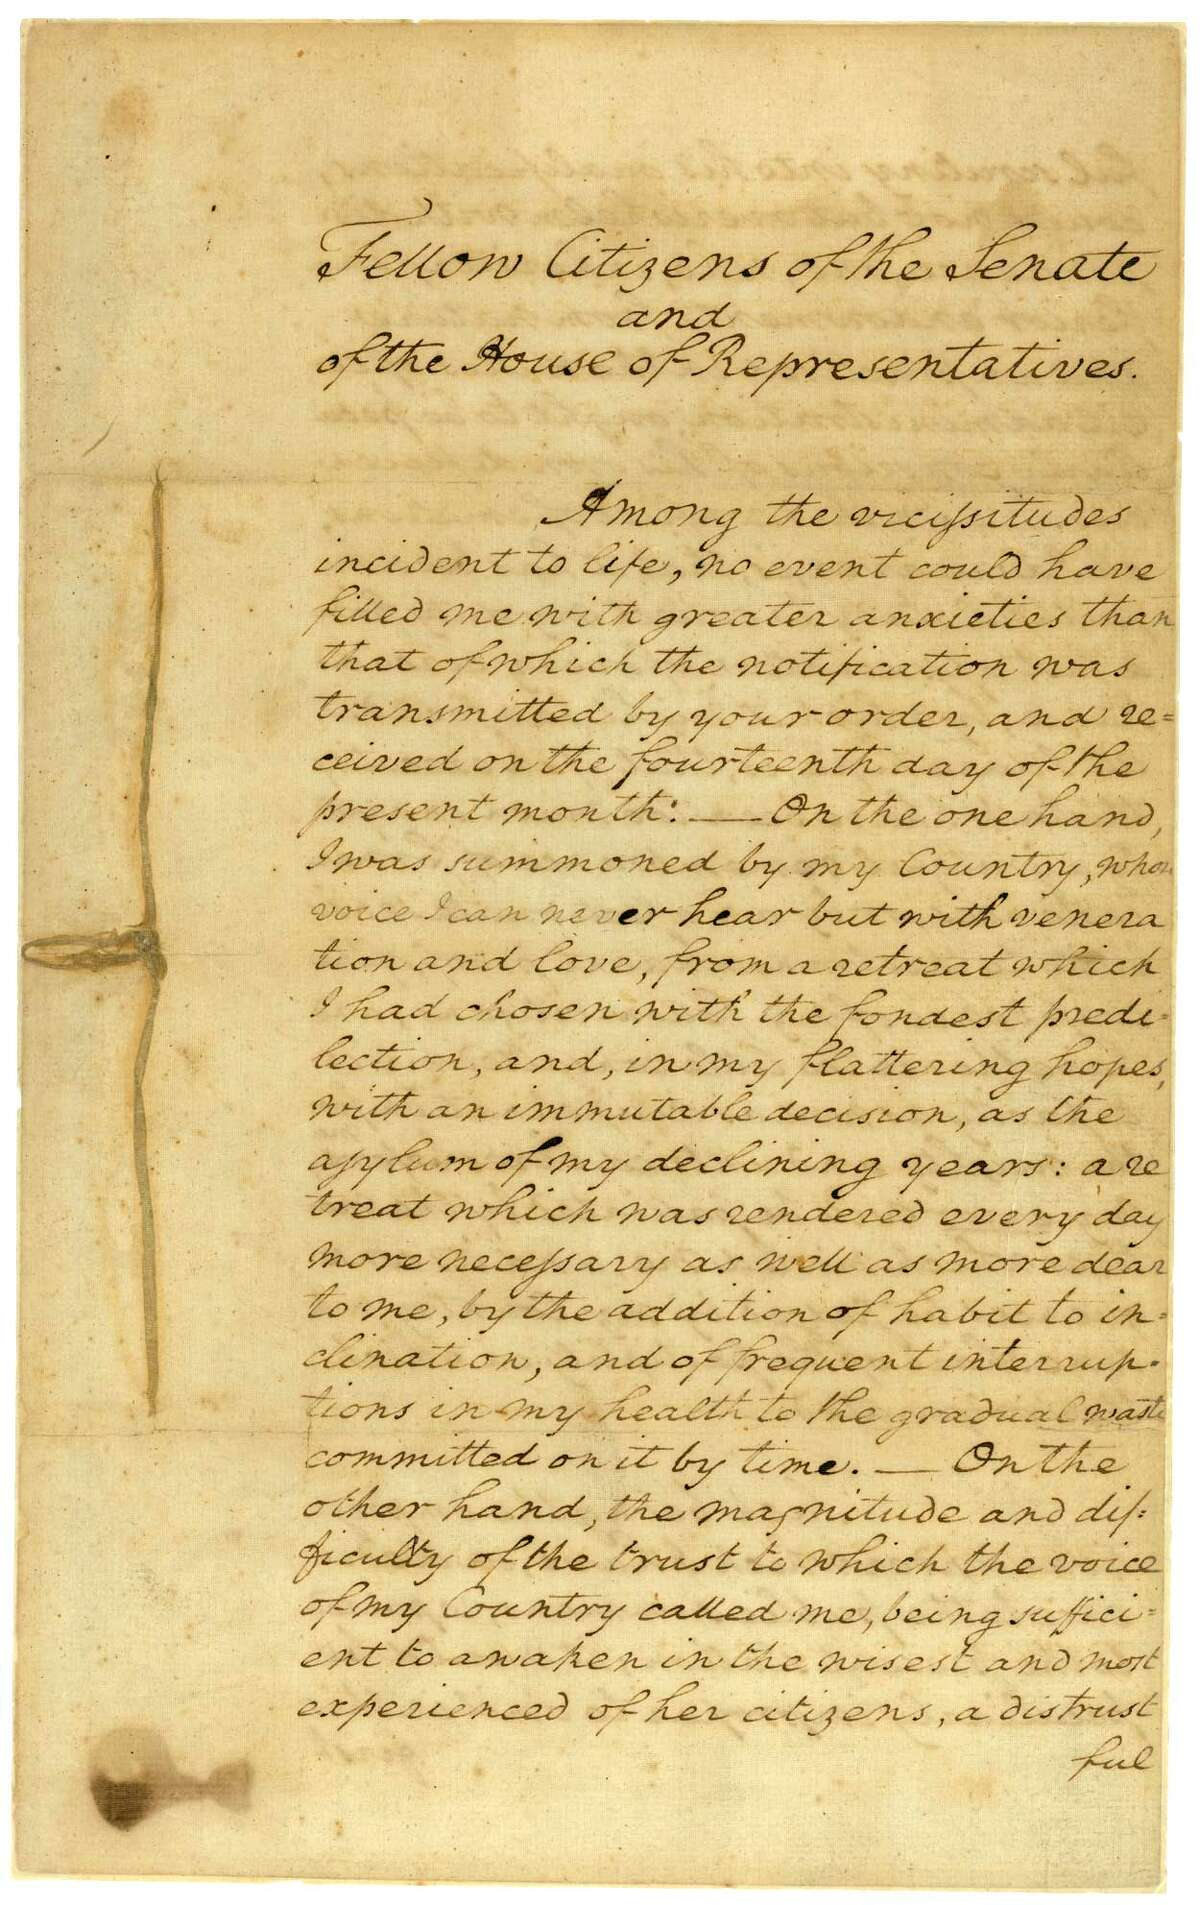 President George Washington's inaugural address of 1789.